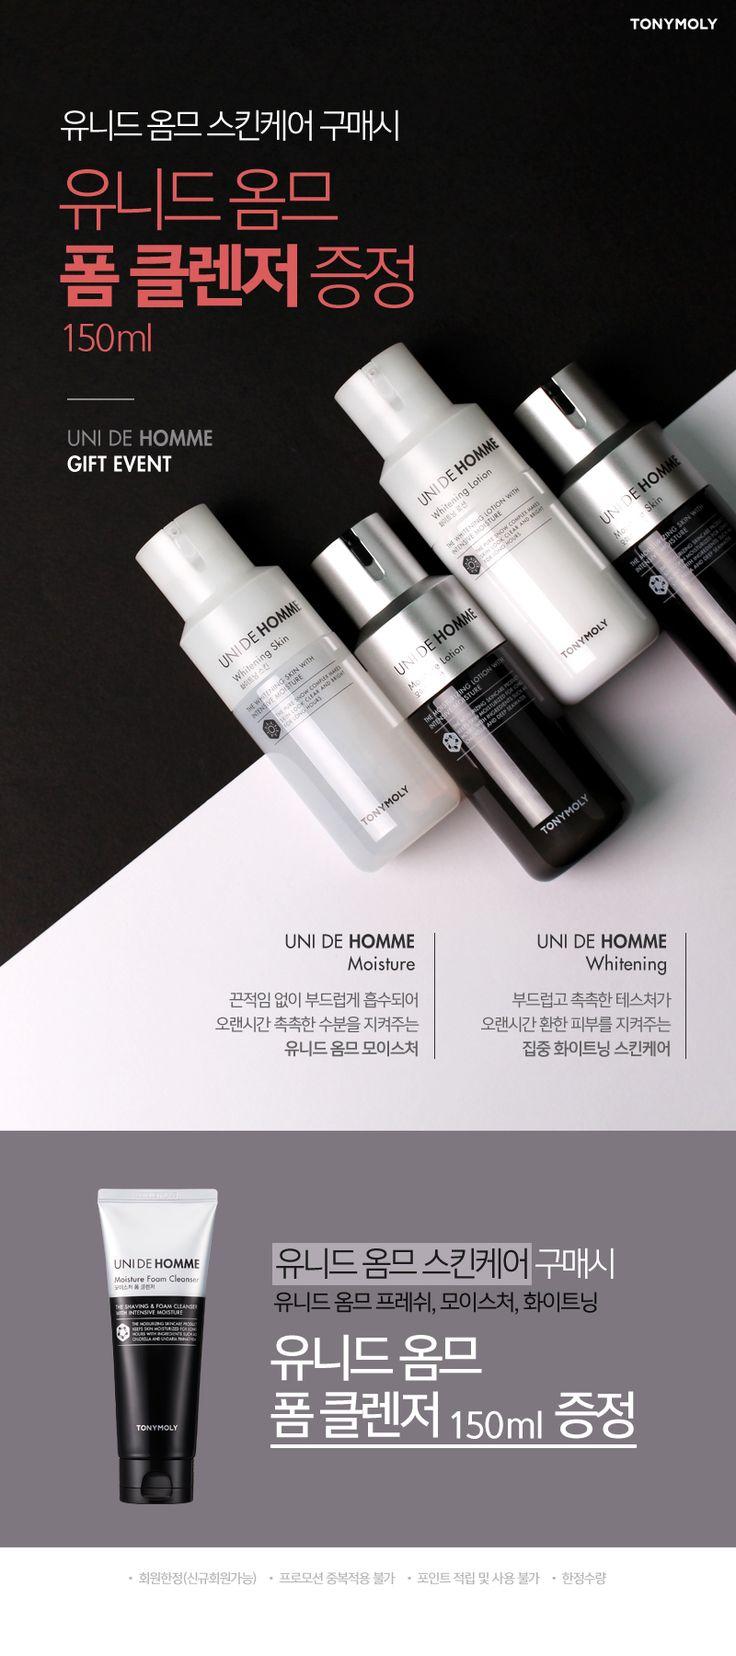 Tony Moly Uni De Homme Product